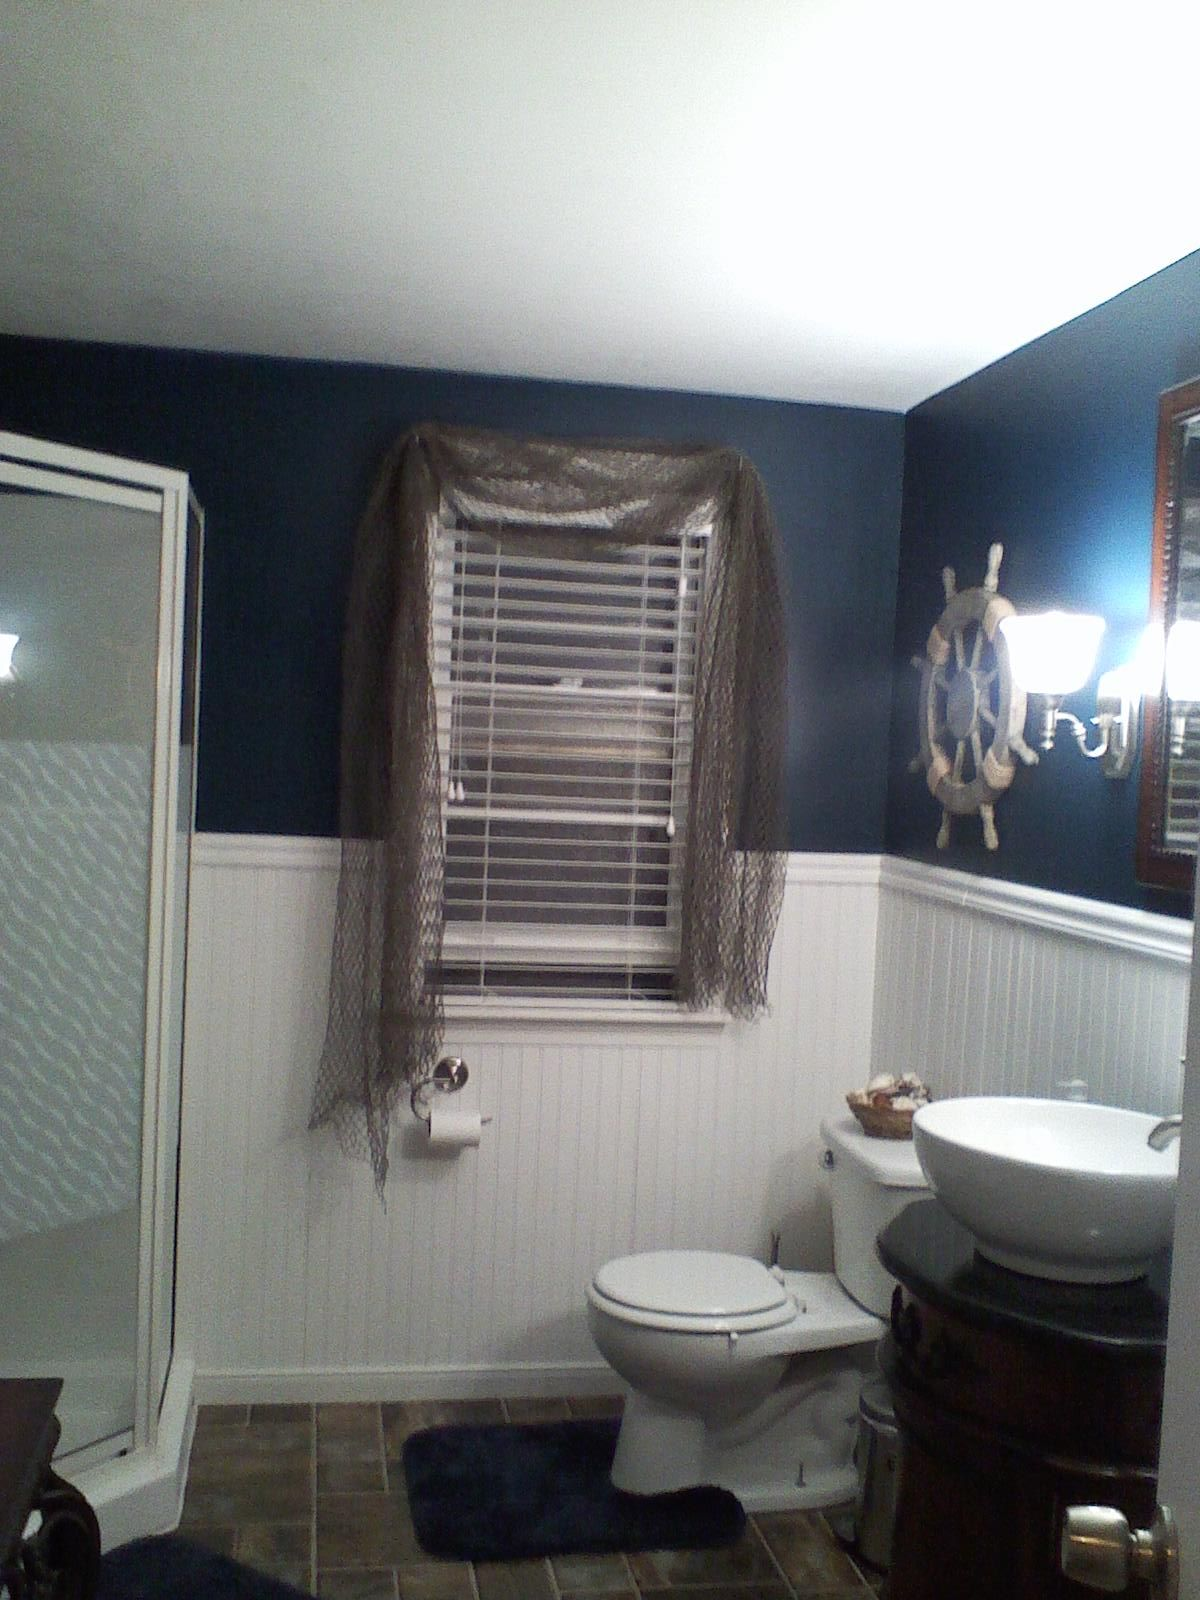 Star Bathroom Decor: Nautical Bathroom Theme. Put Fish Net Over Dark Ble